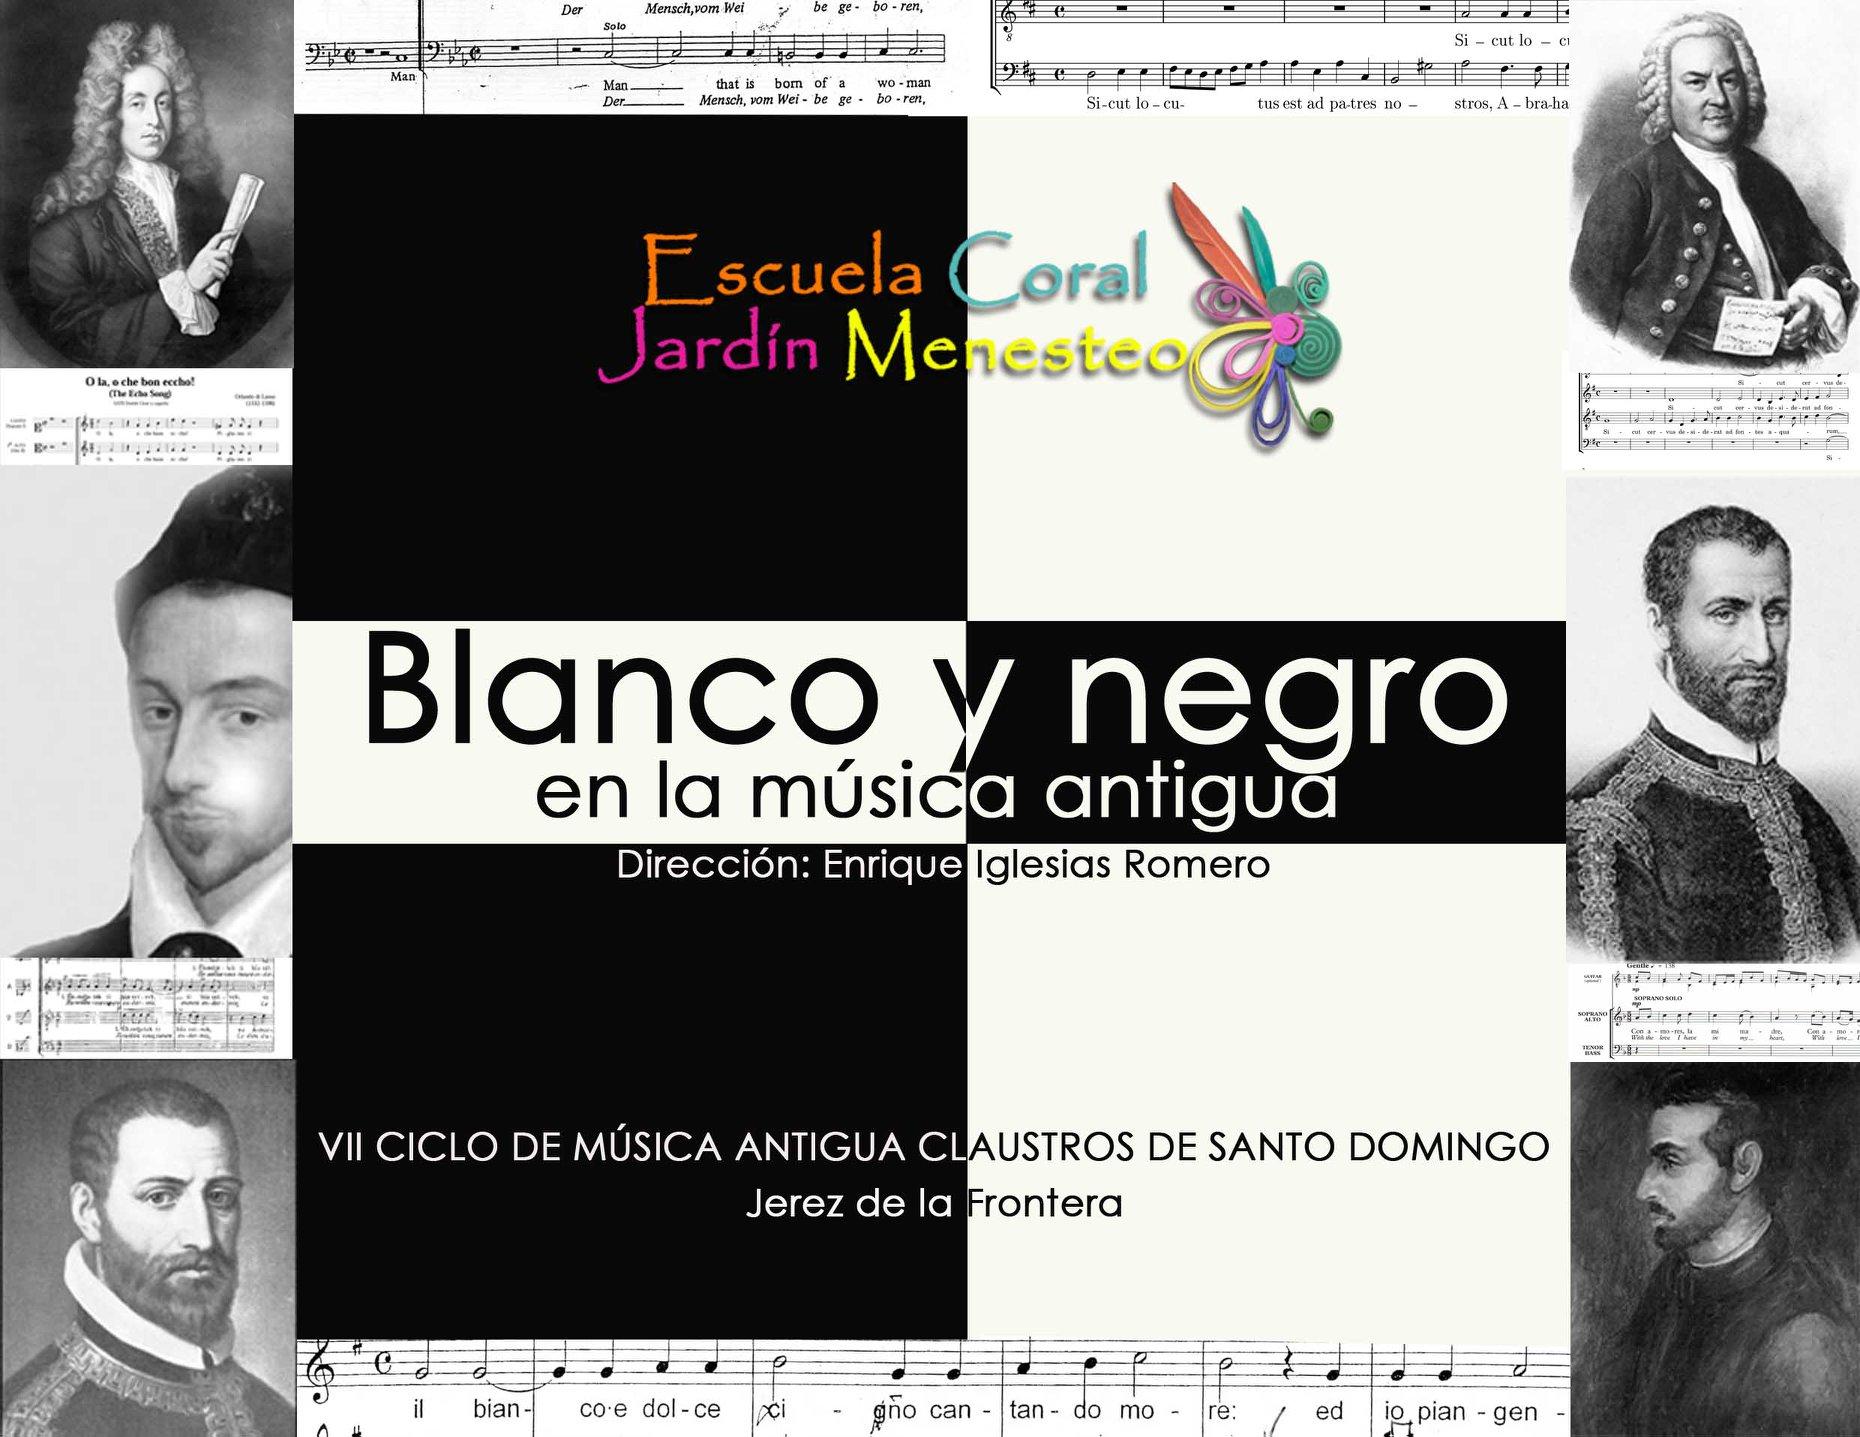 VII CICLO DE MUSICA ANTIGUA